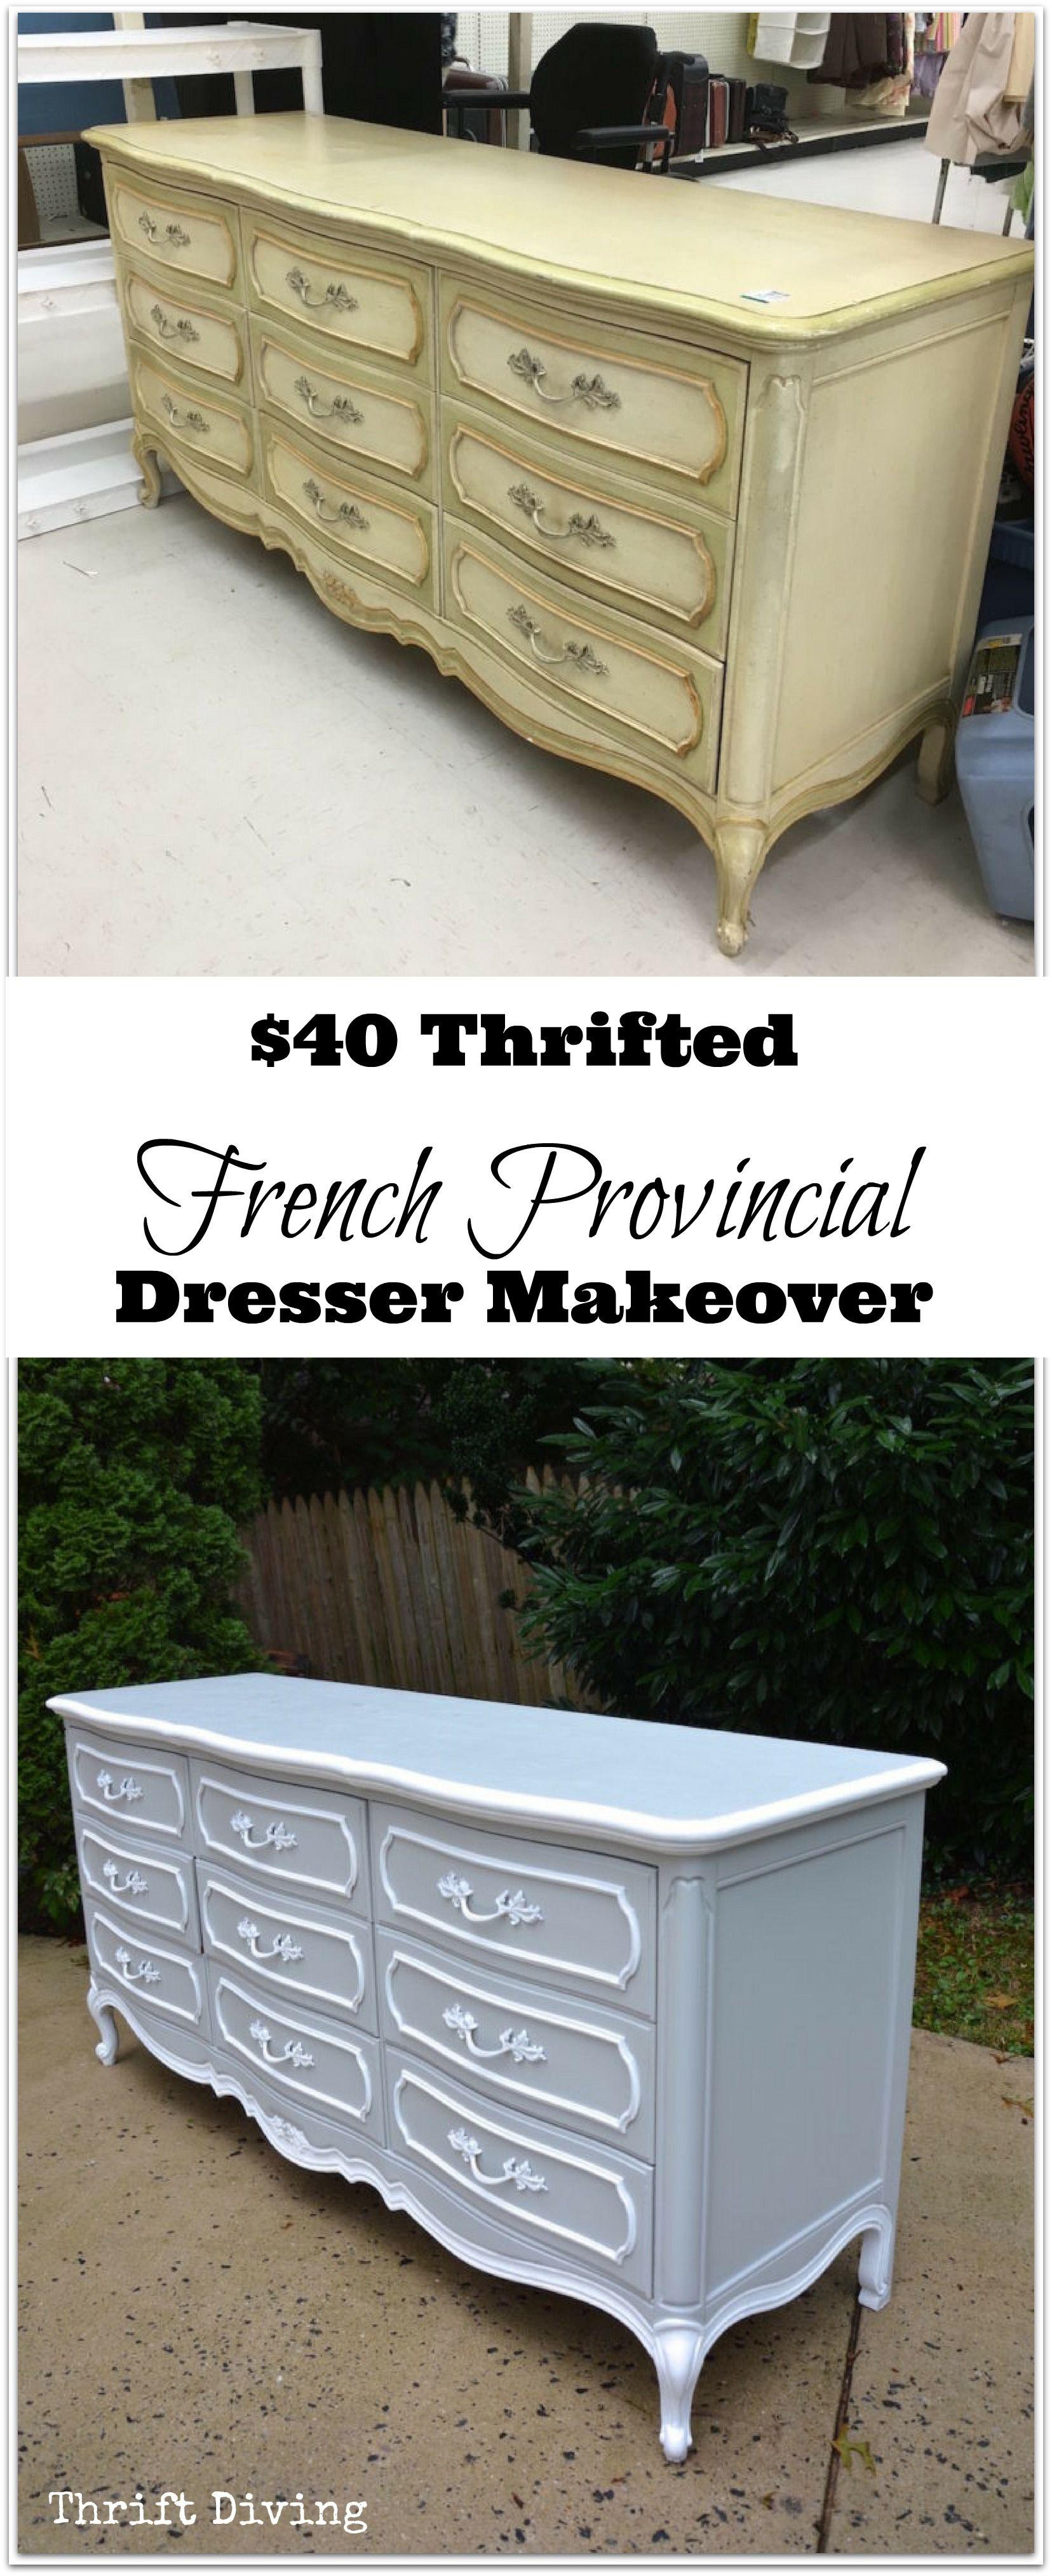 DIY Dresser Makeover The $40 Thrifted French Provincial Dresser